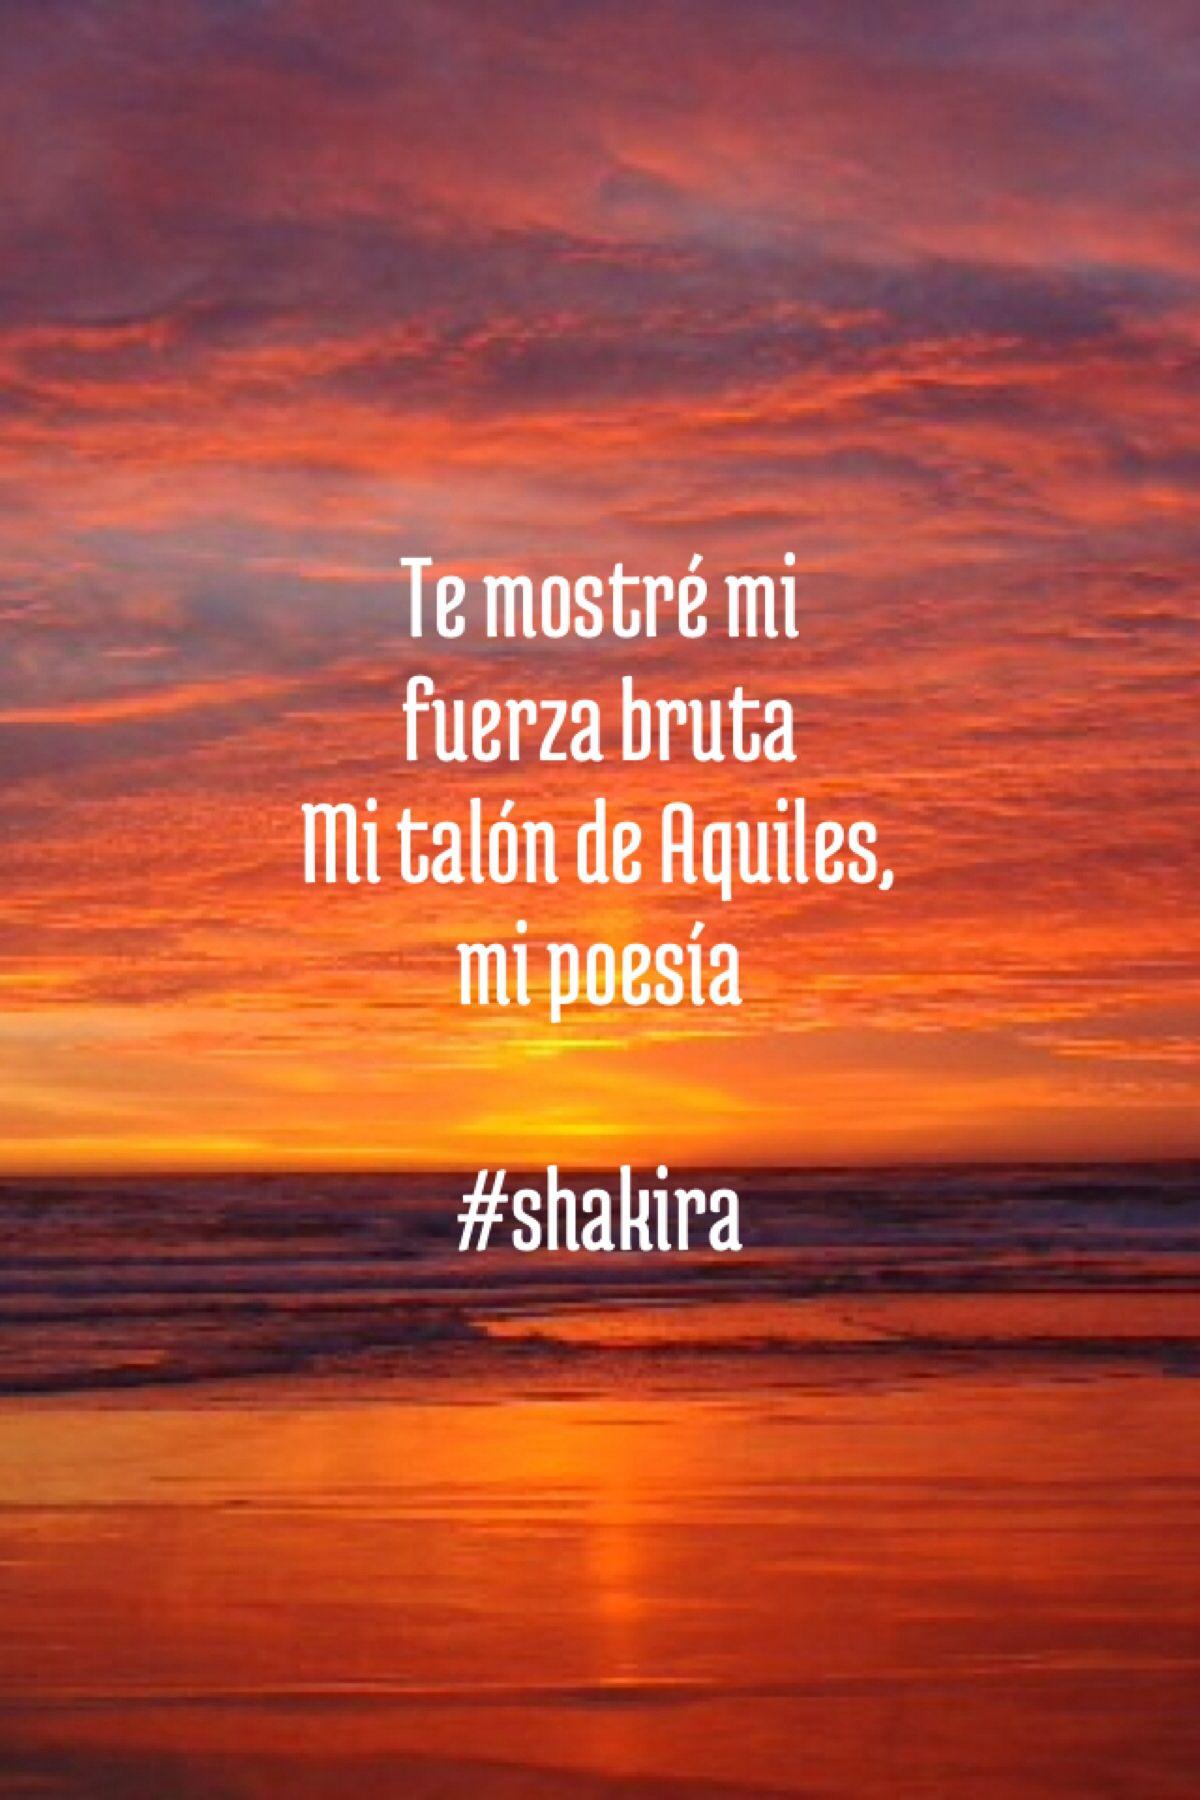 39 Ideas De Shakira Shakira Canciones Shakira Frases De Canciones